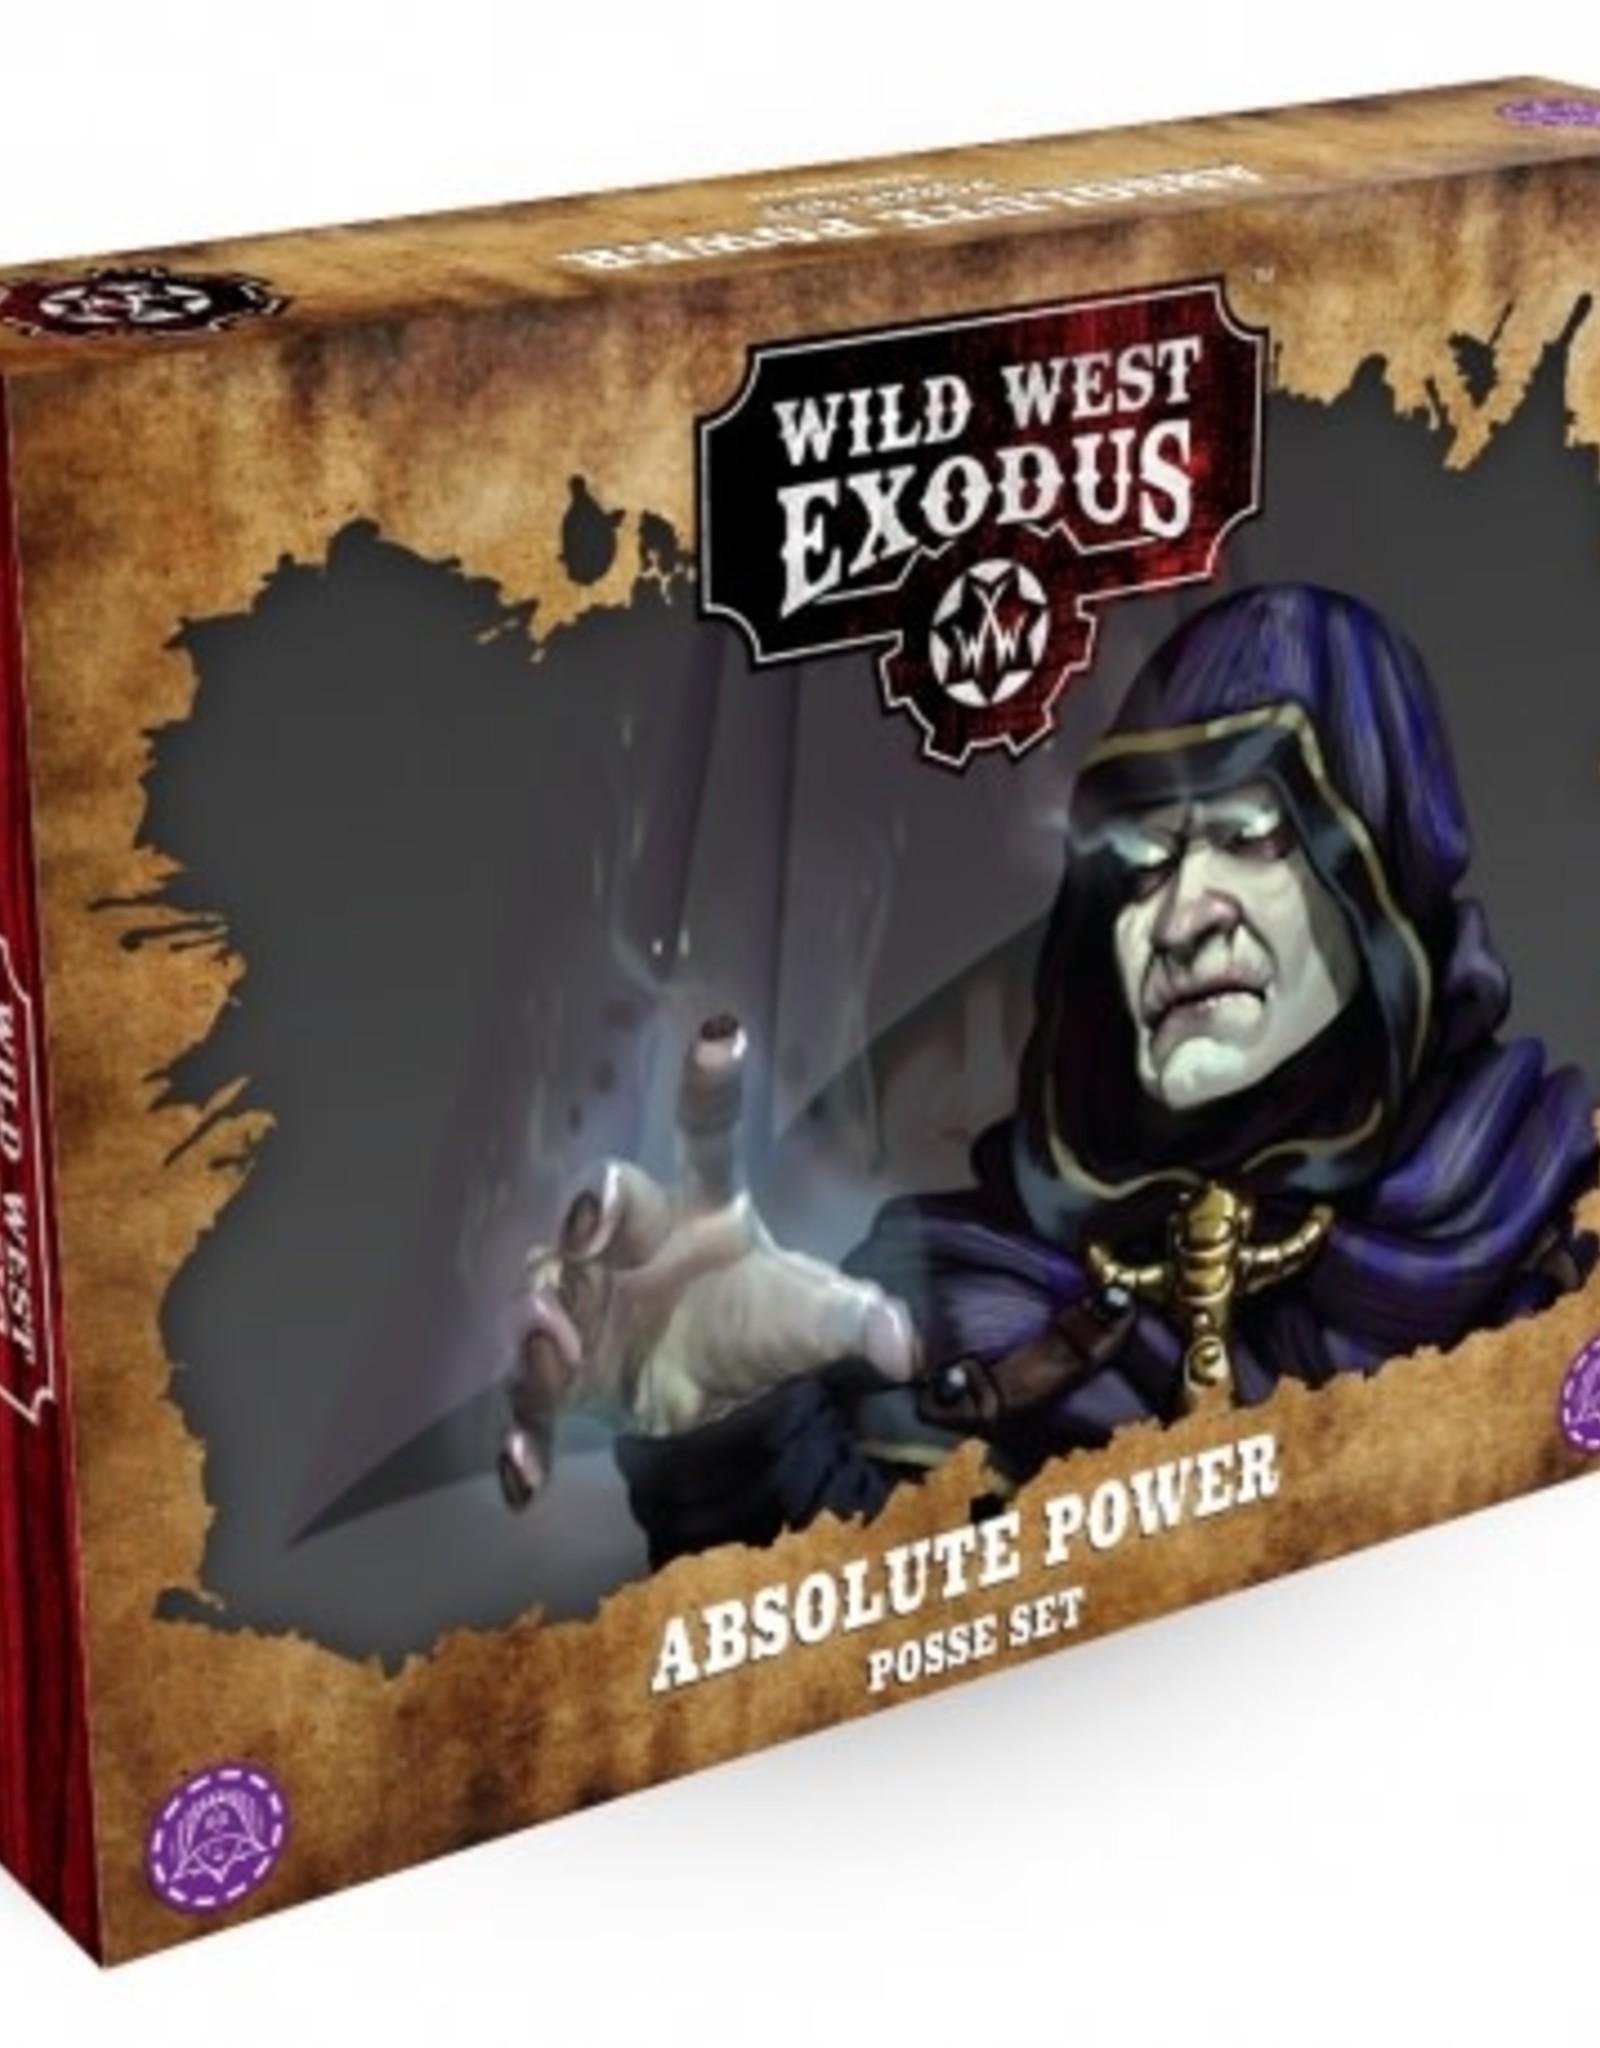 Warcradle Absolute Power Posse Box